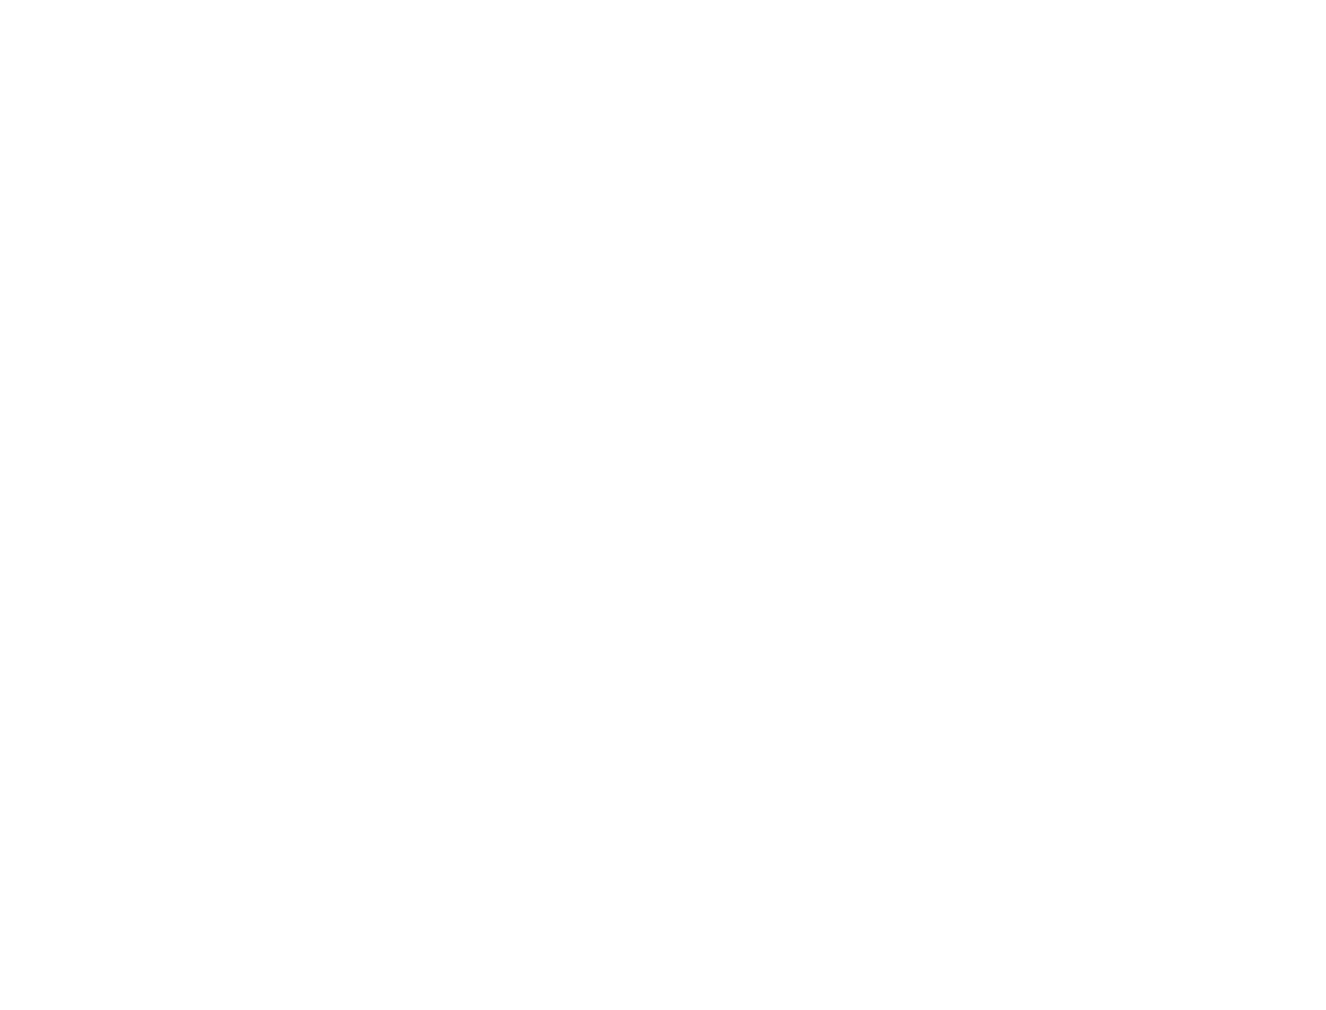 THR GRILL